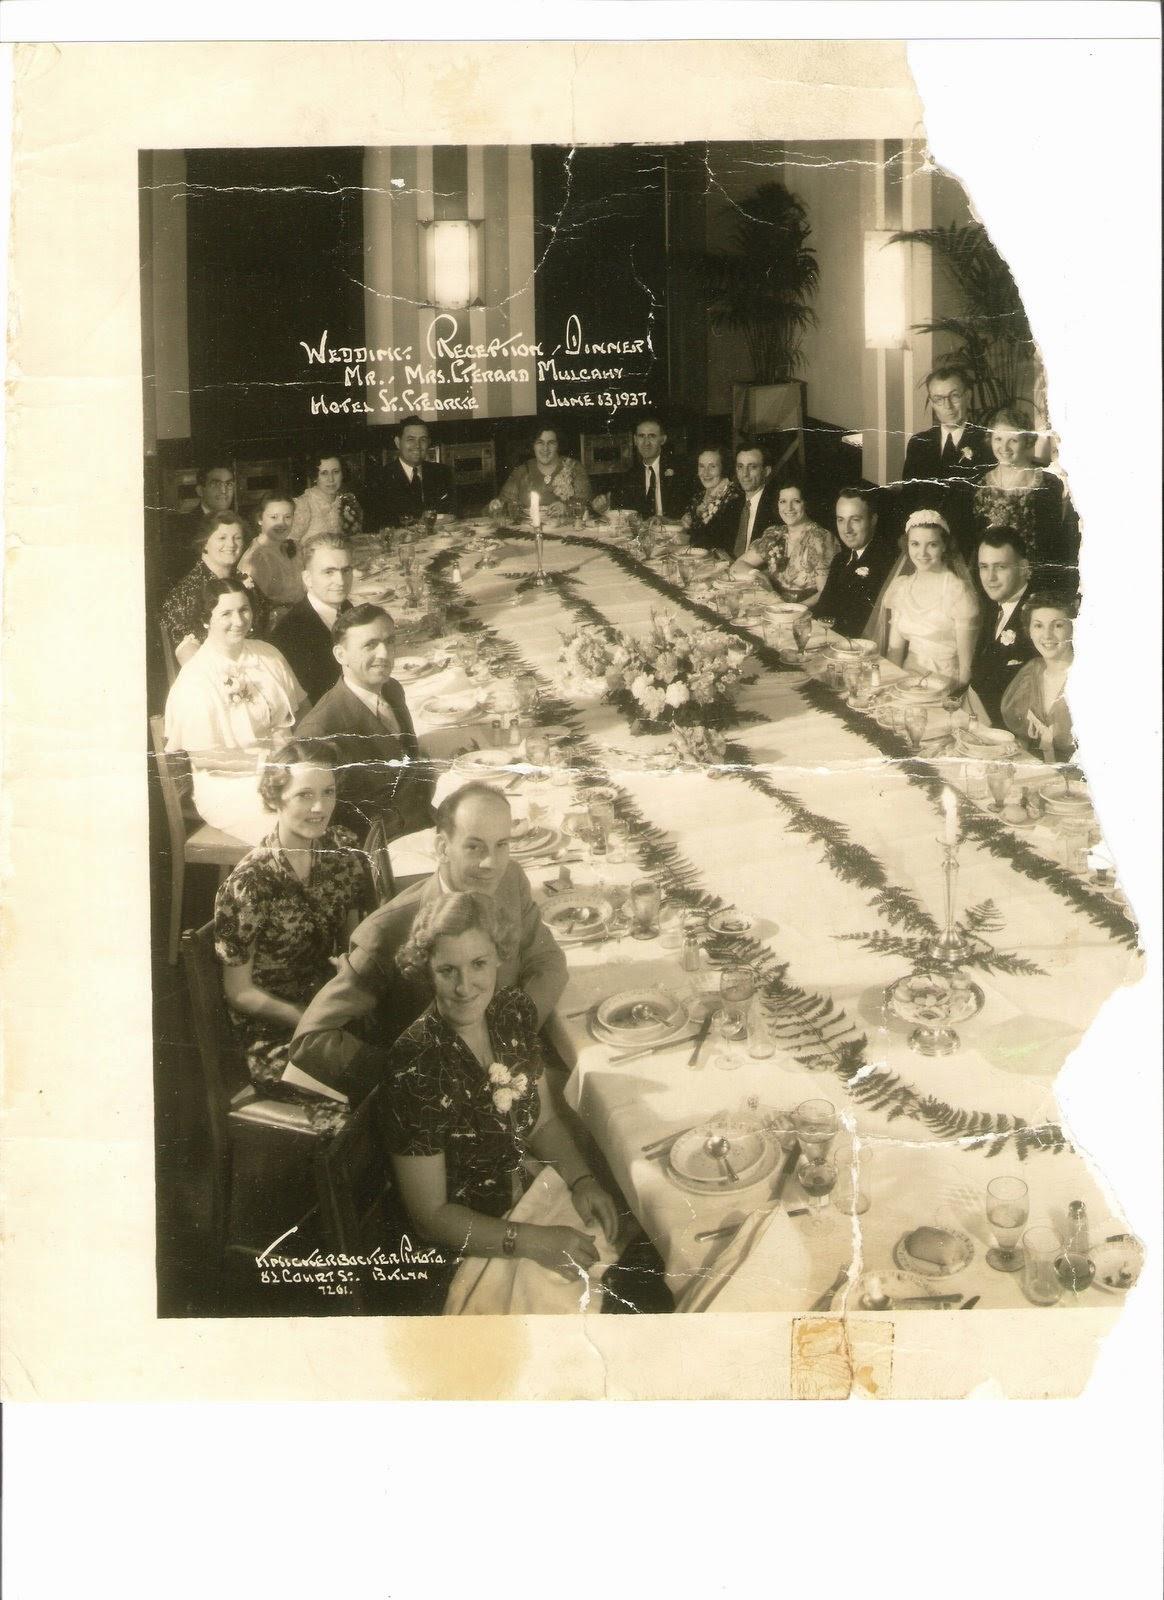 Hotel St. George, Mulcahy, Danaher, 1937